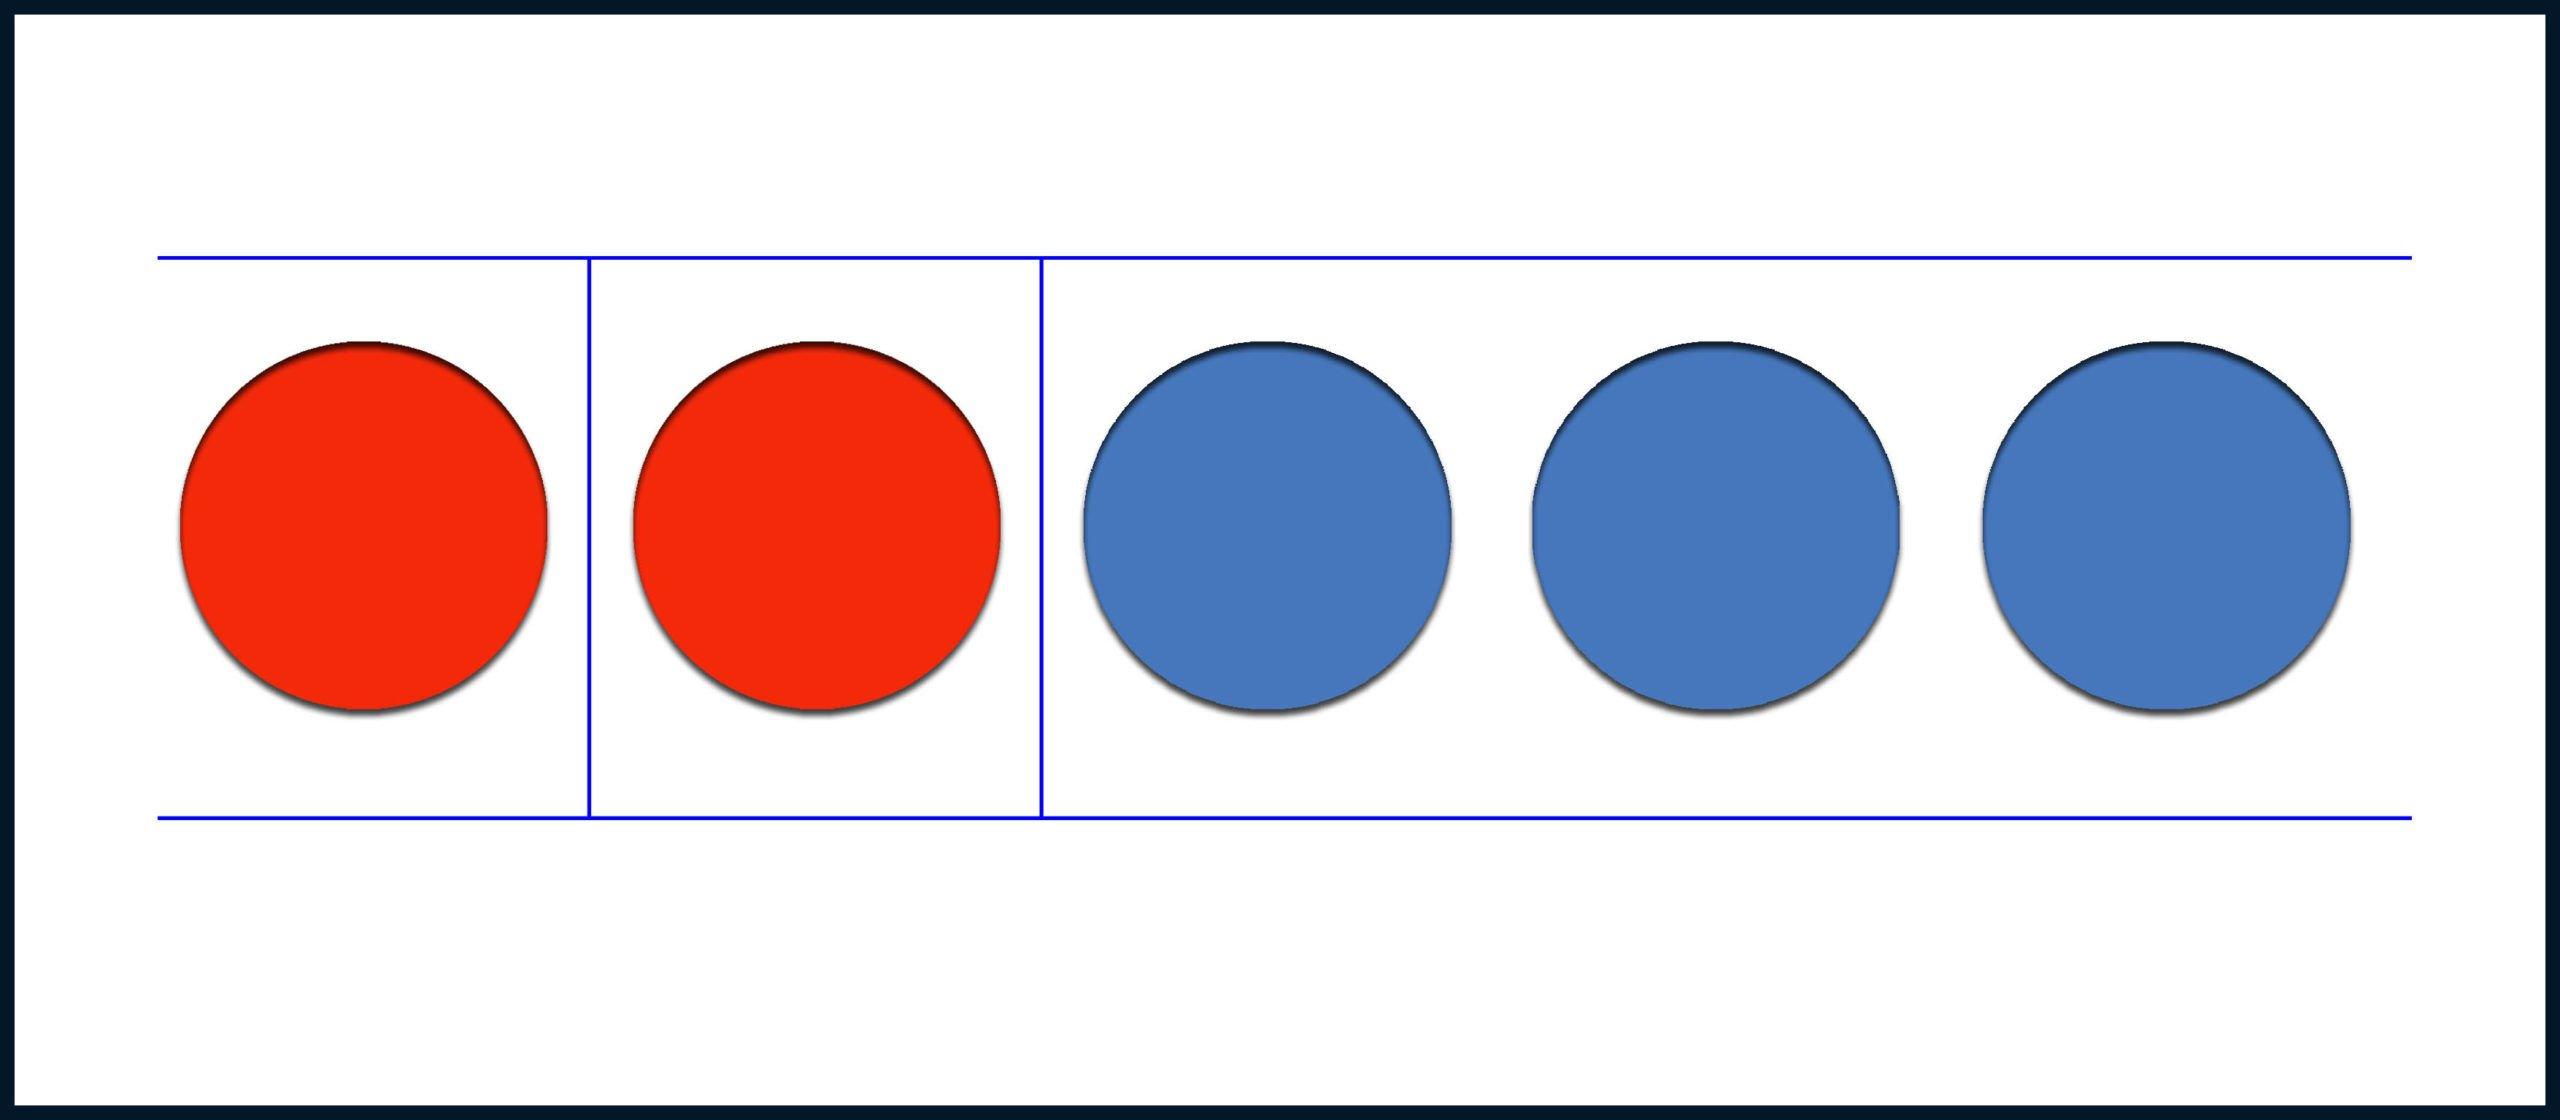 Осталось два красных круга